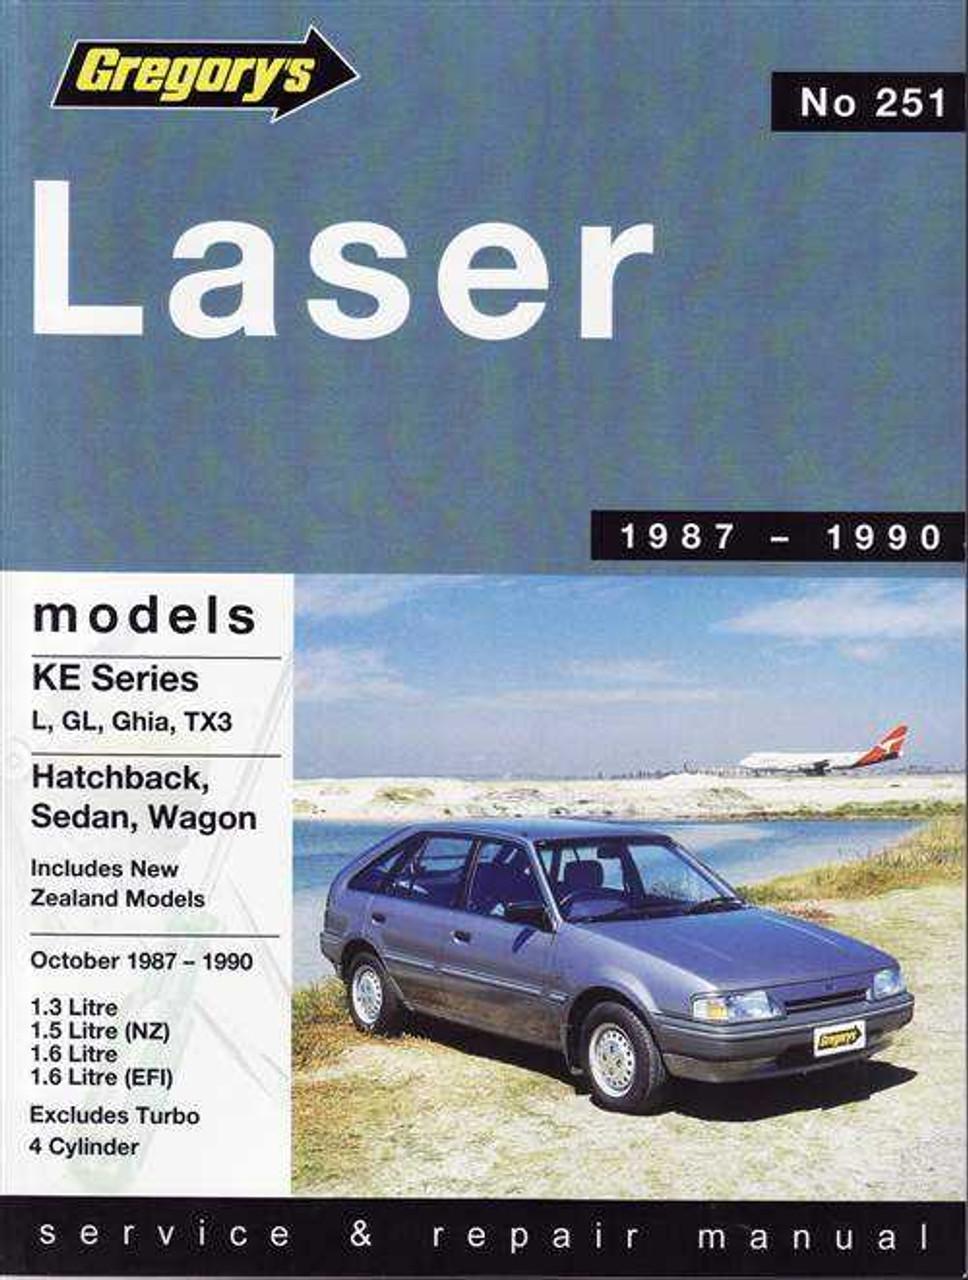 ford laser ke series 1987 1990 workshop manual rh automotobookshop com au Sri Lanka 1981 Ford Laser Sri Lanka 1981 Ford Laser